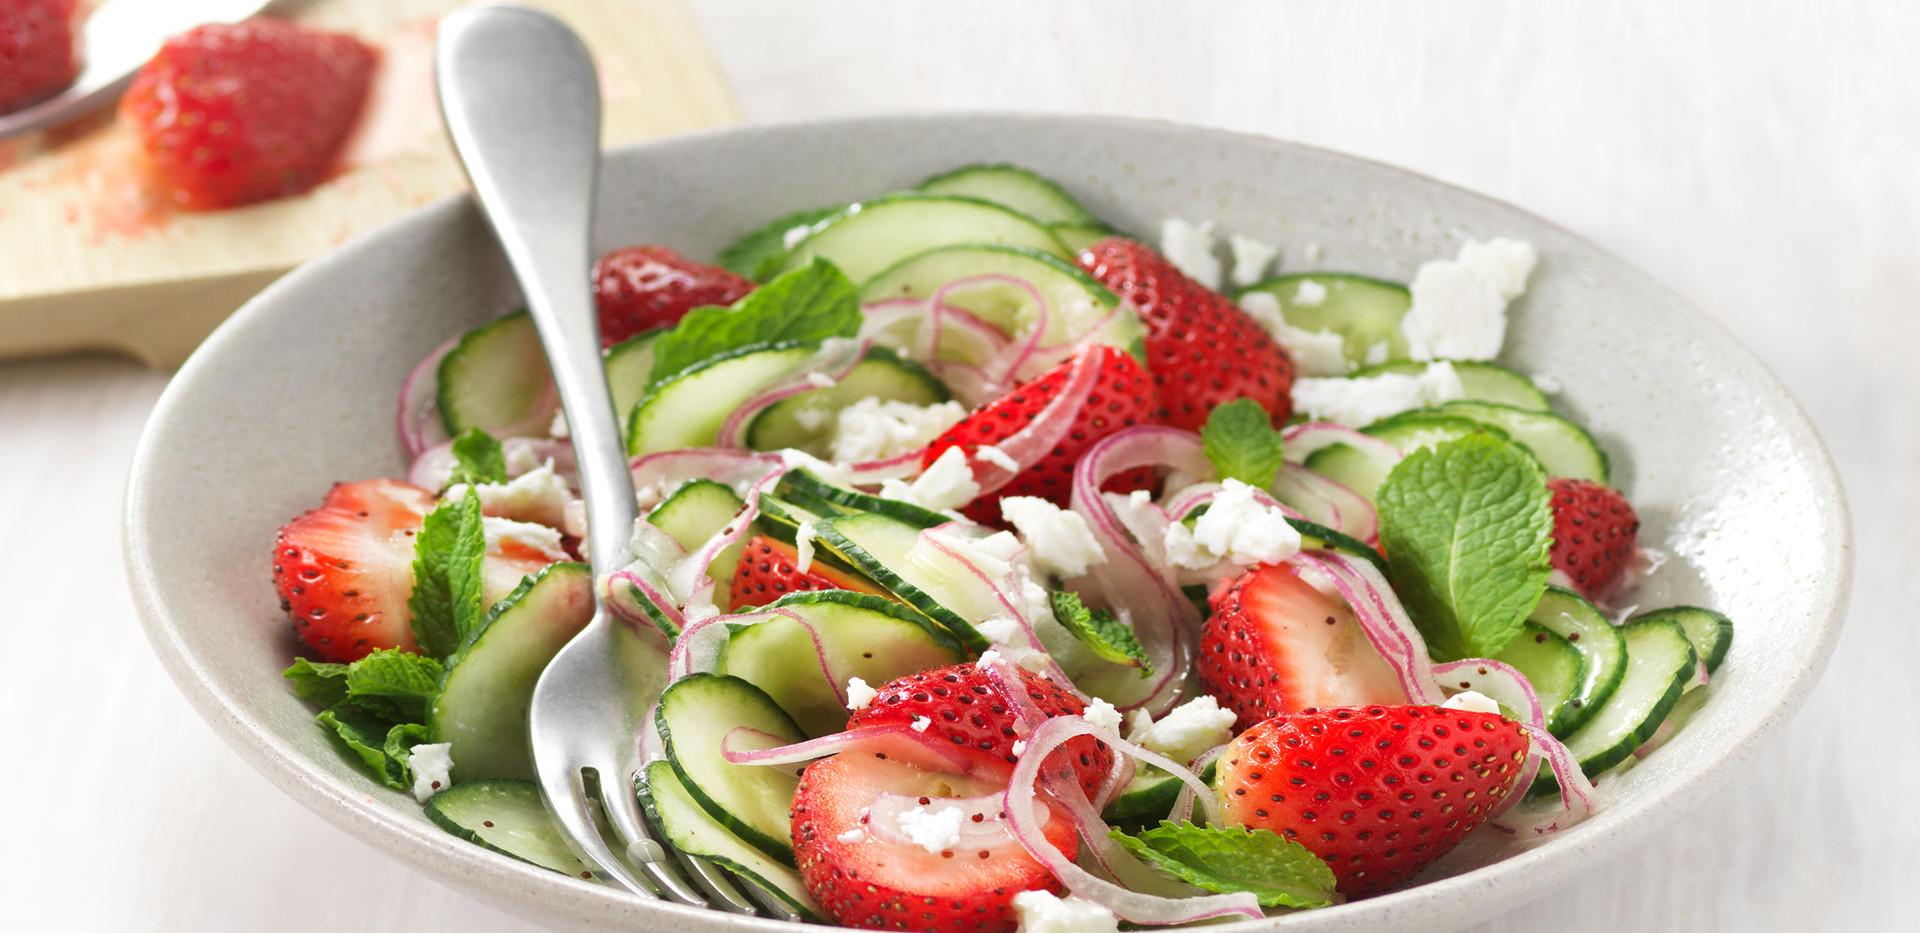 CucumberStrawberrySalad2.jpg